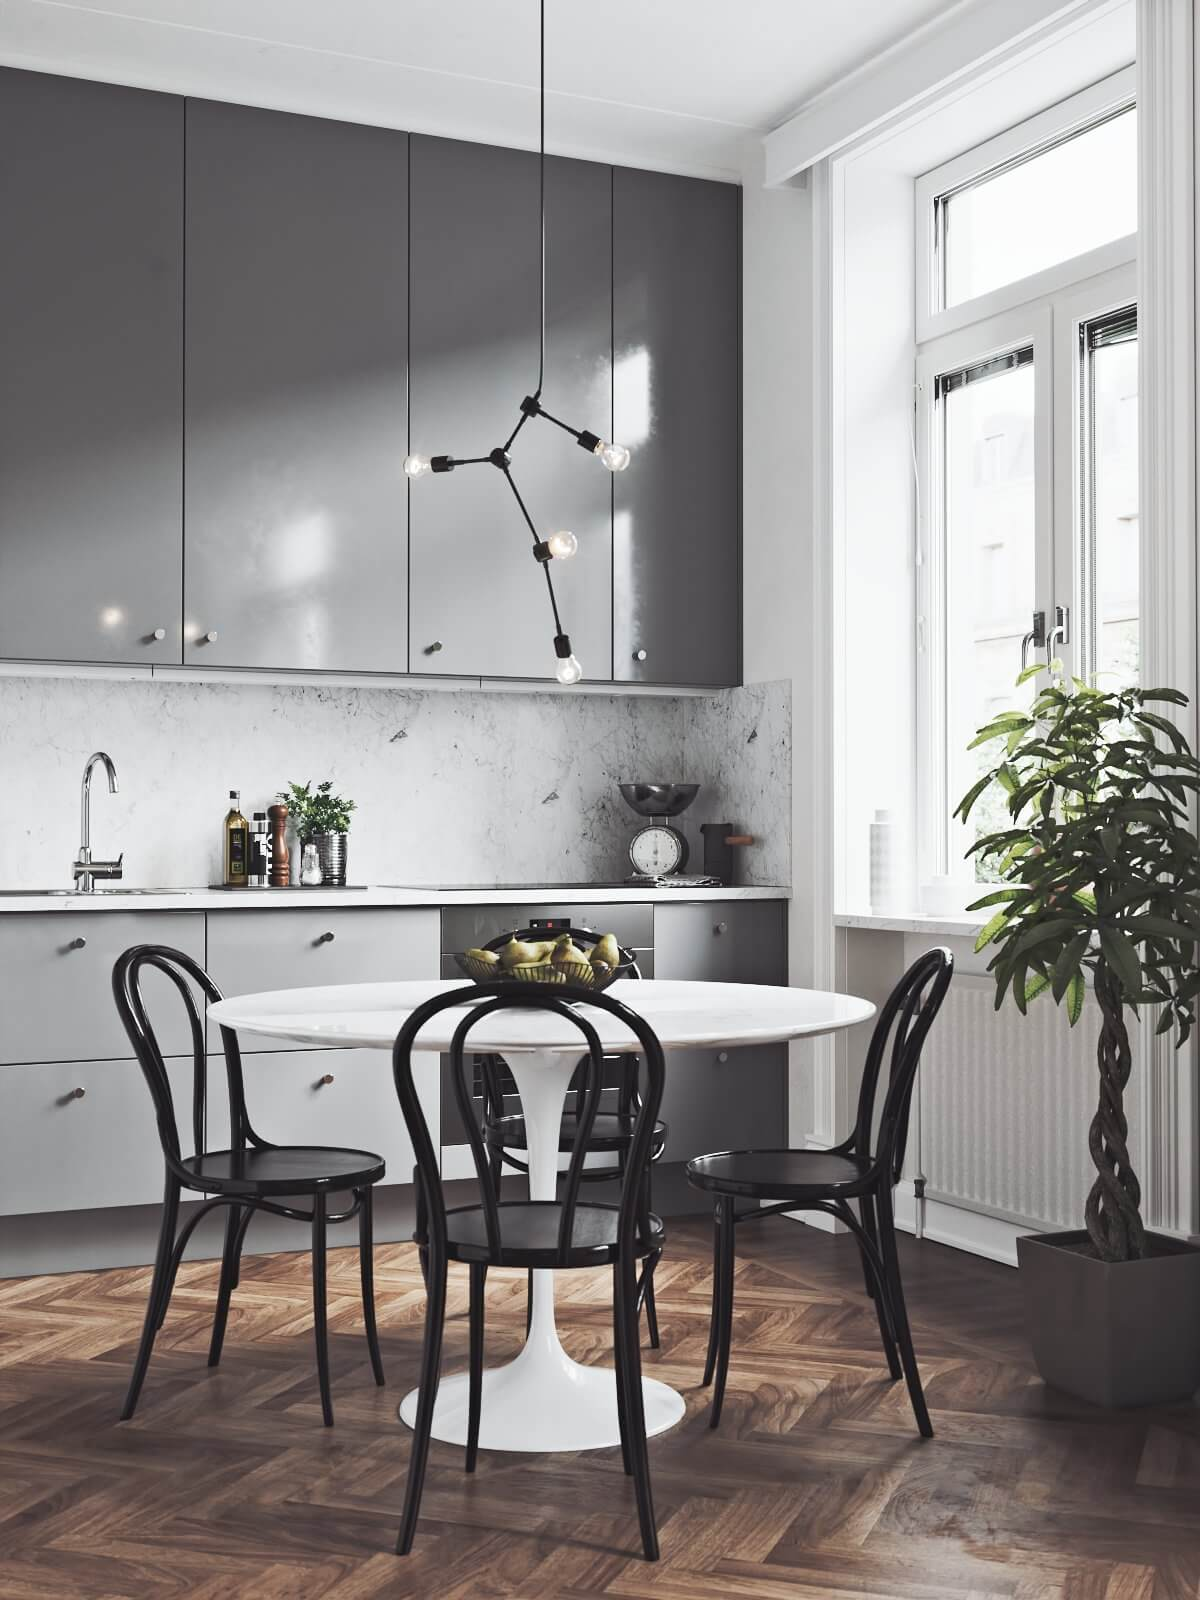 Scandinavian flat kitchen dining table - cgi visualization